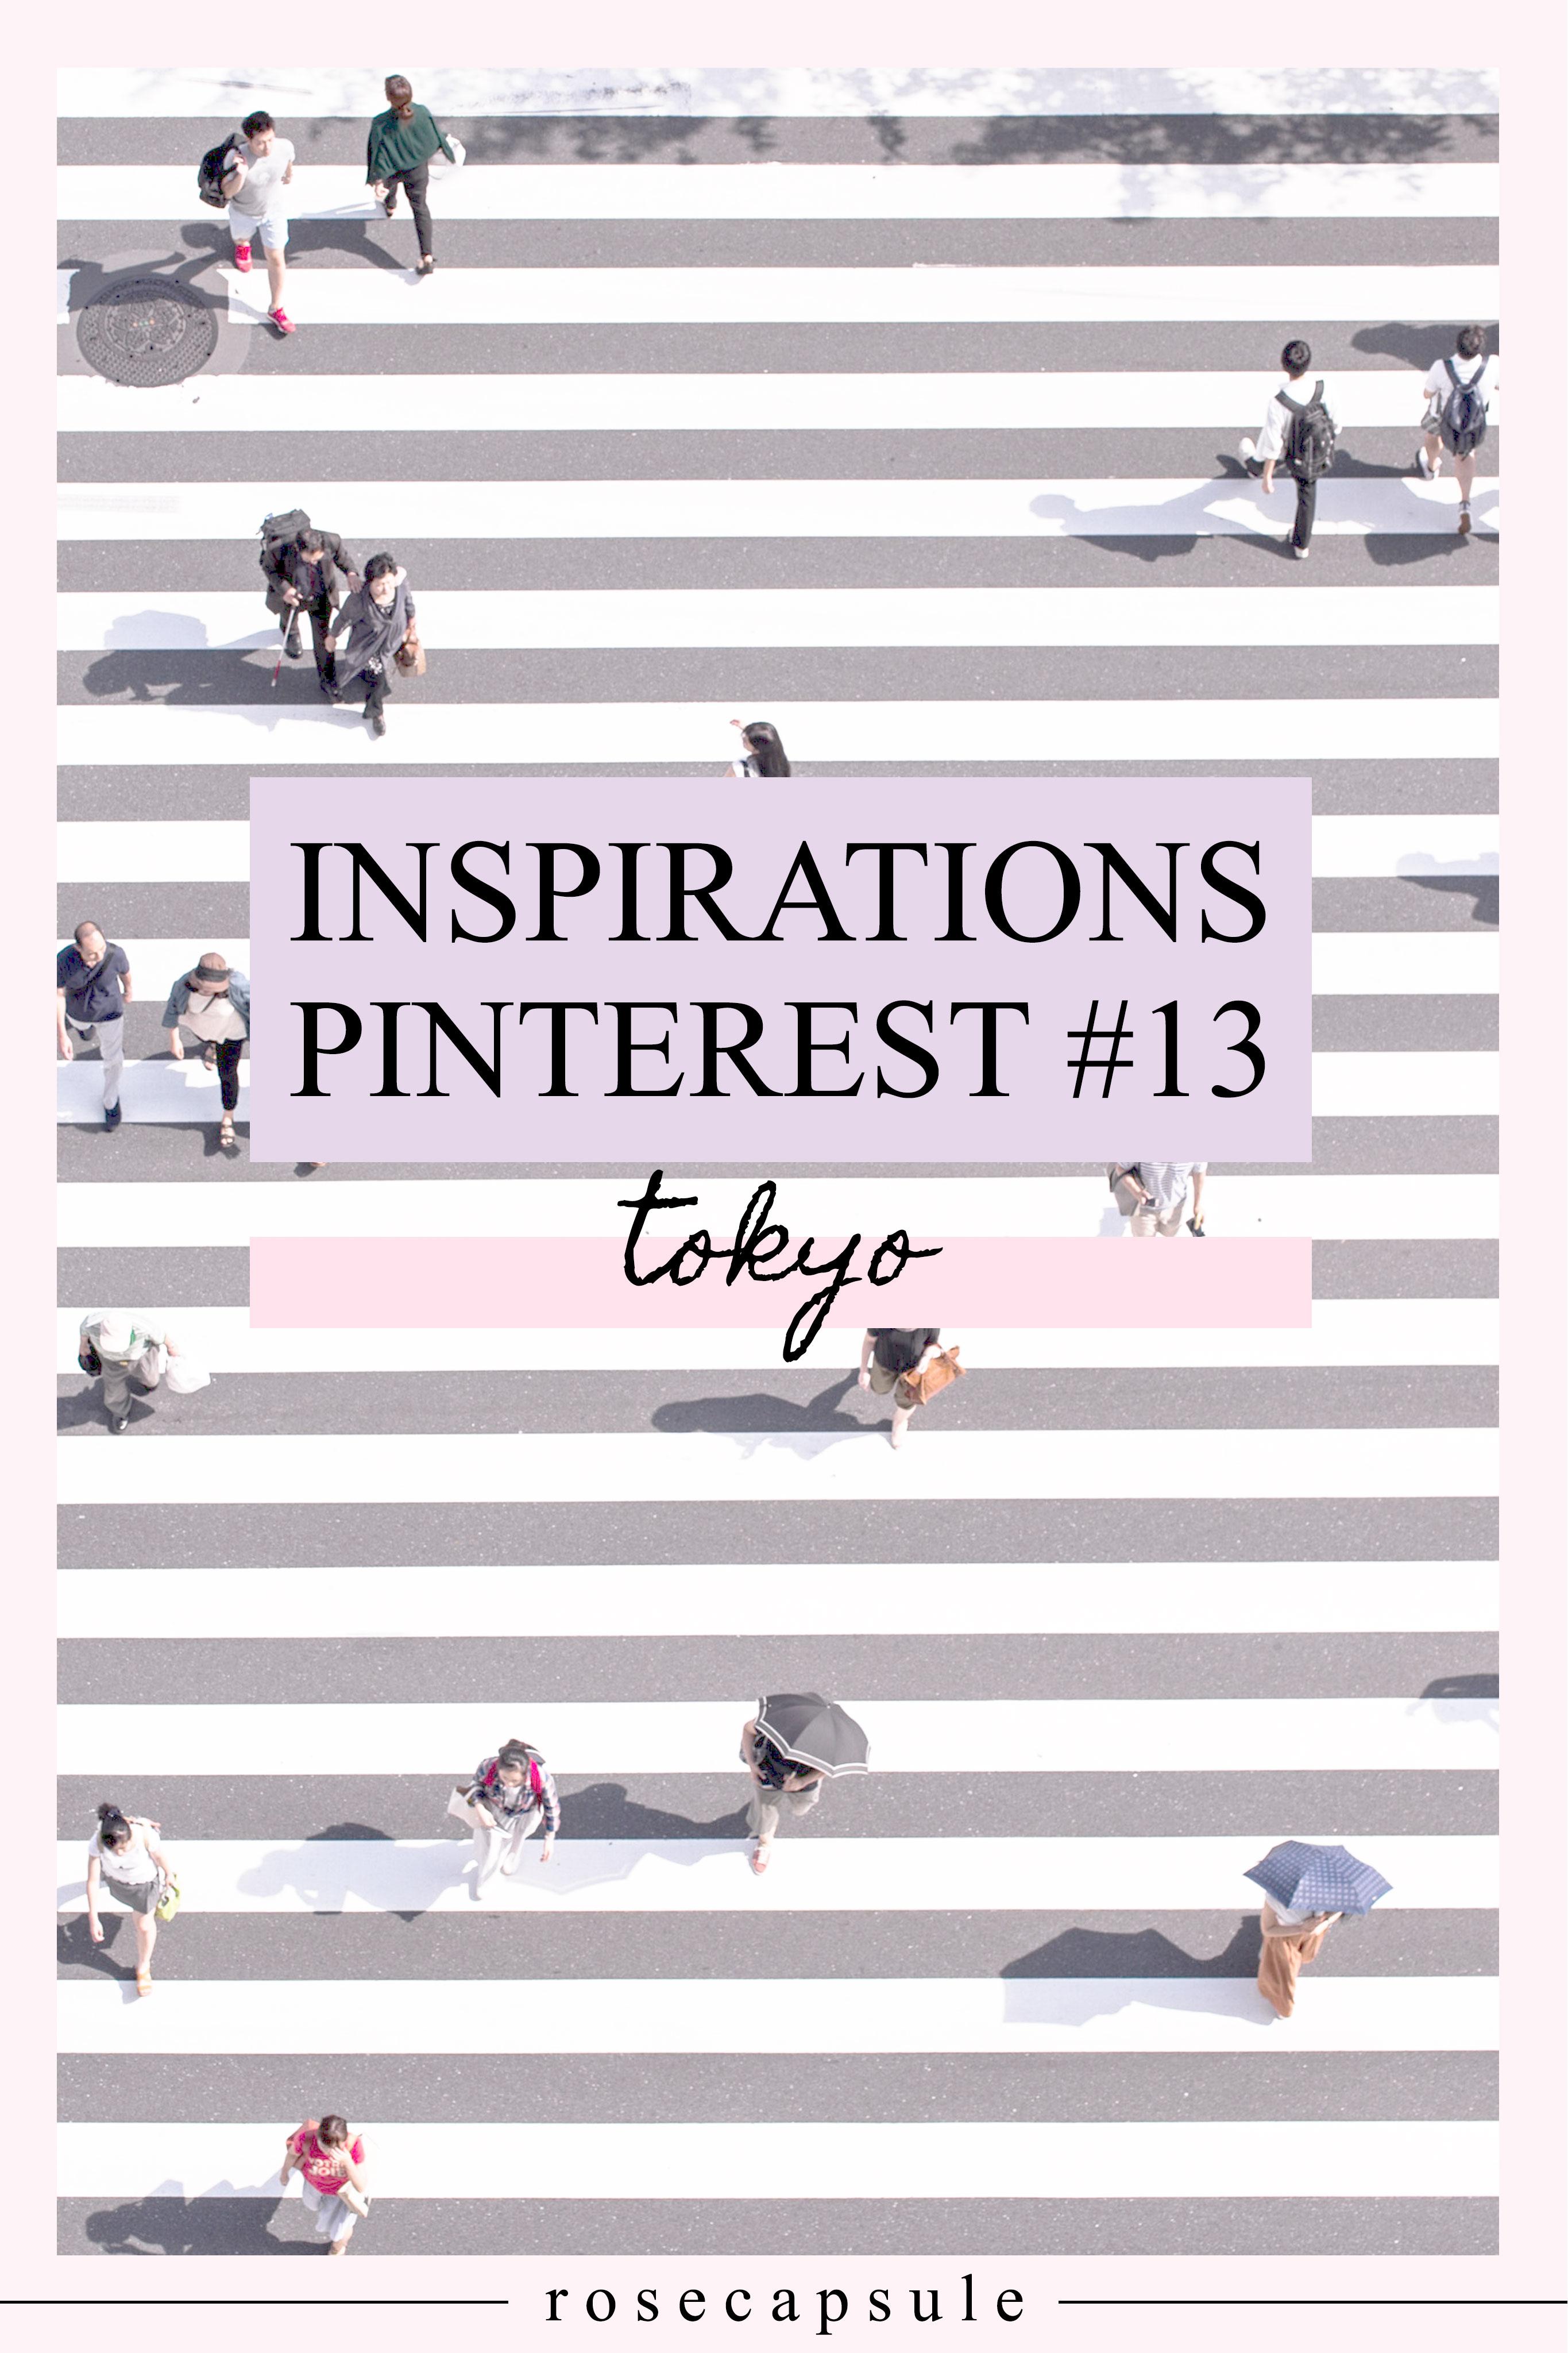 Inspirations Pinterest 13 : Tokyo